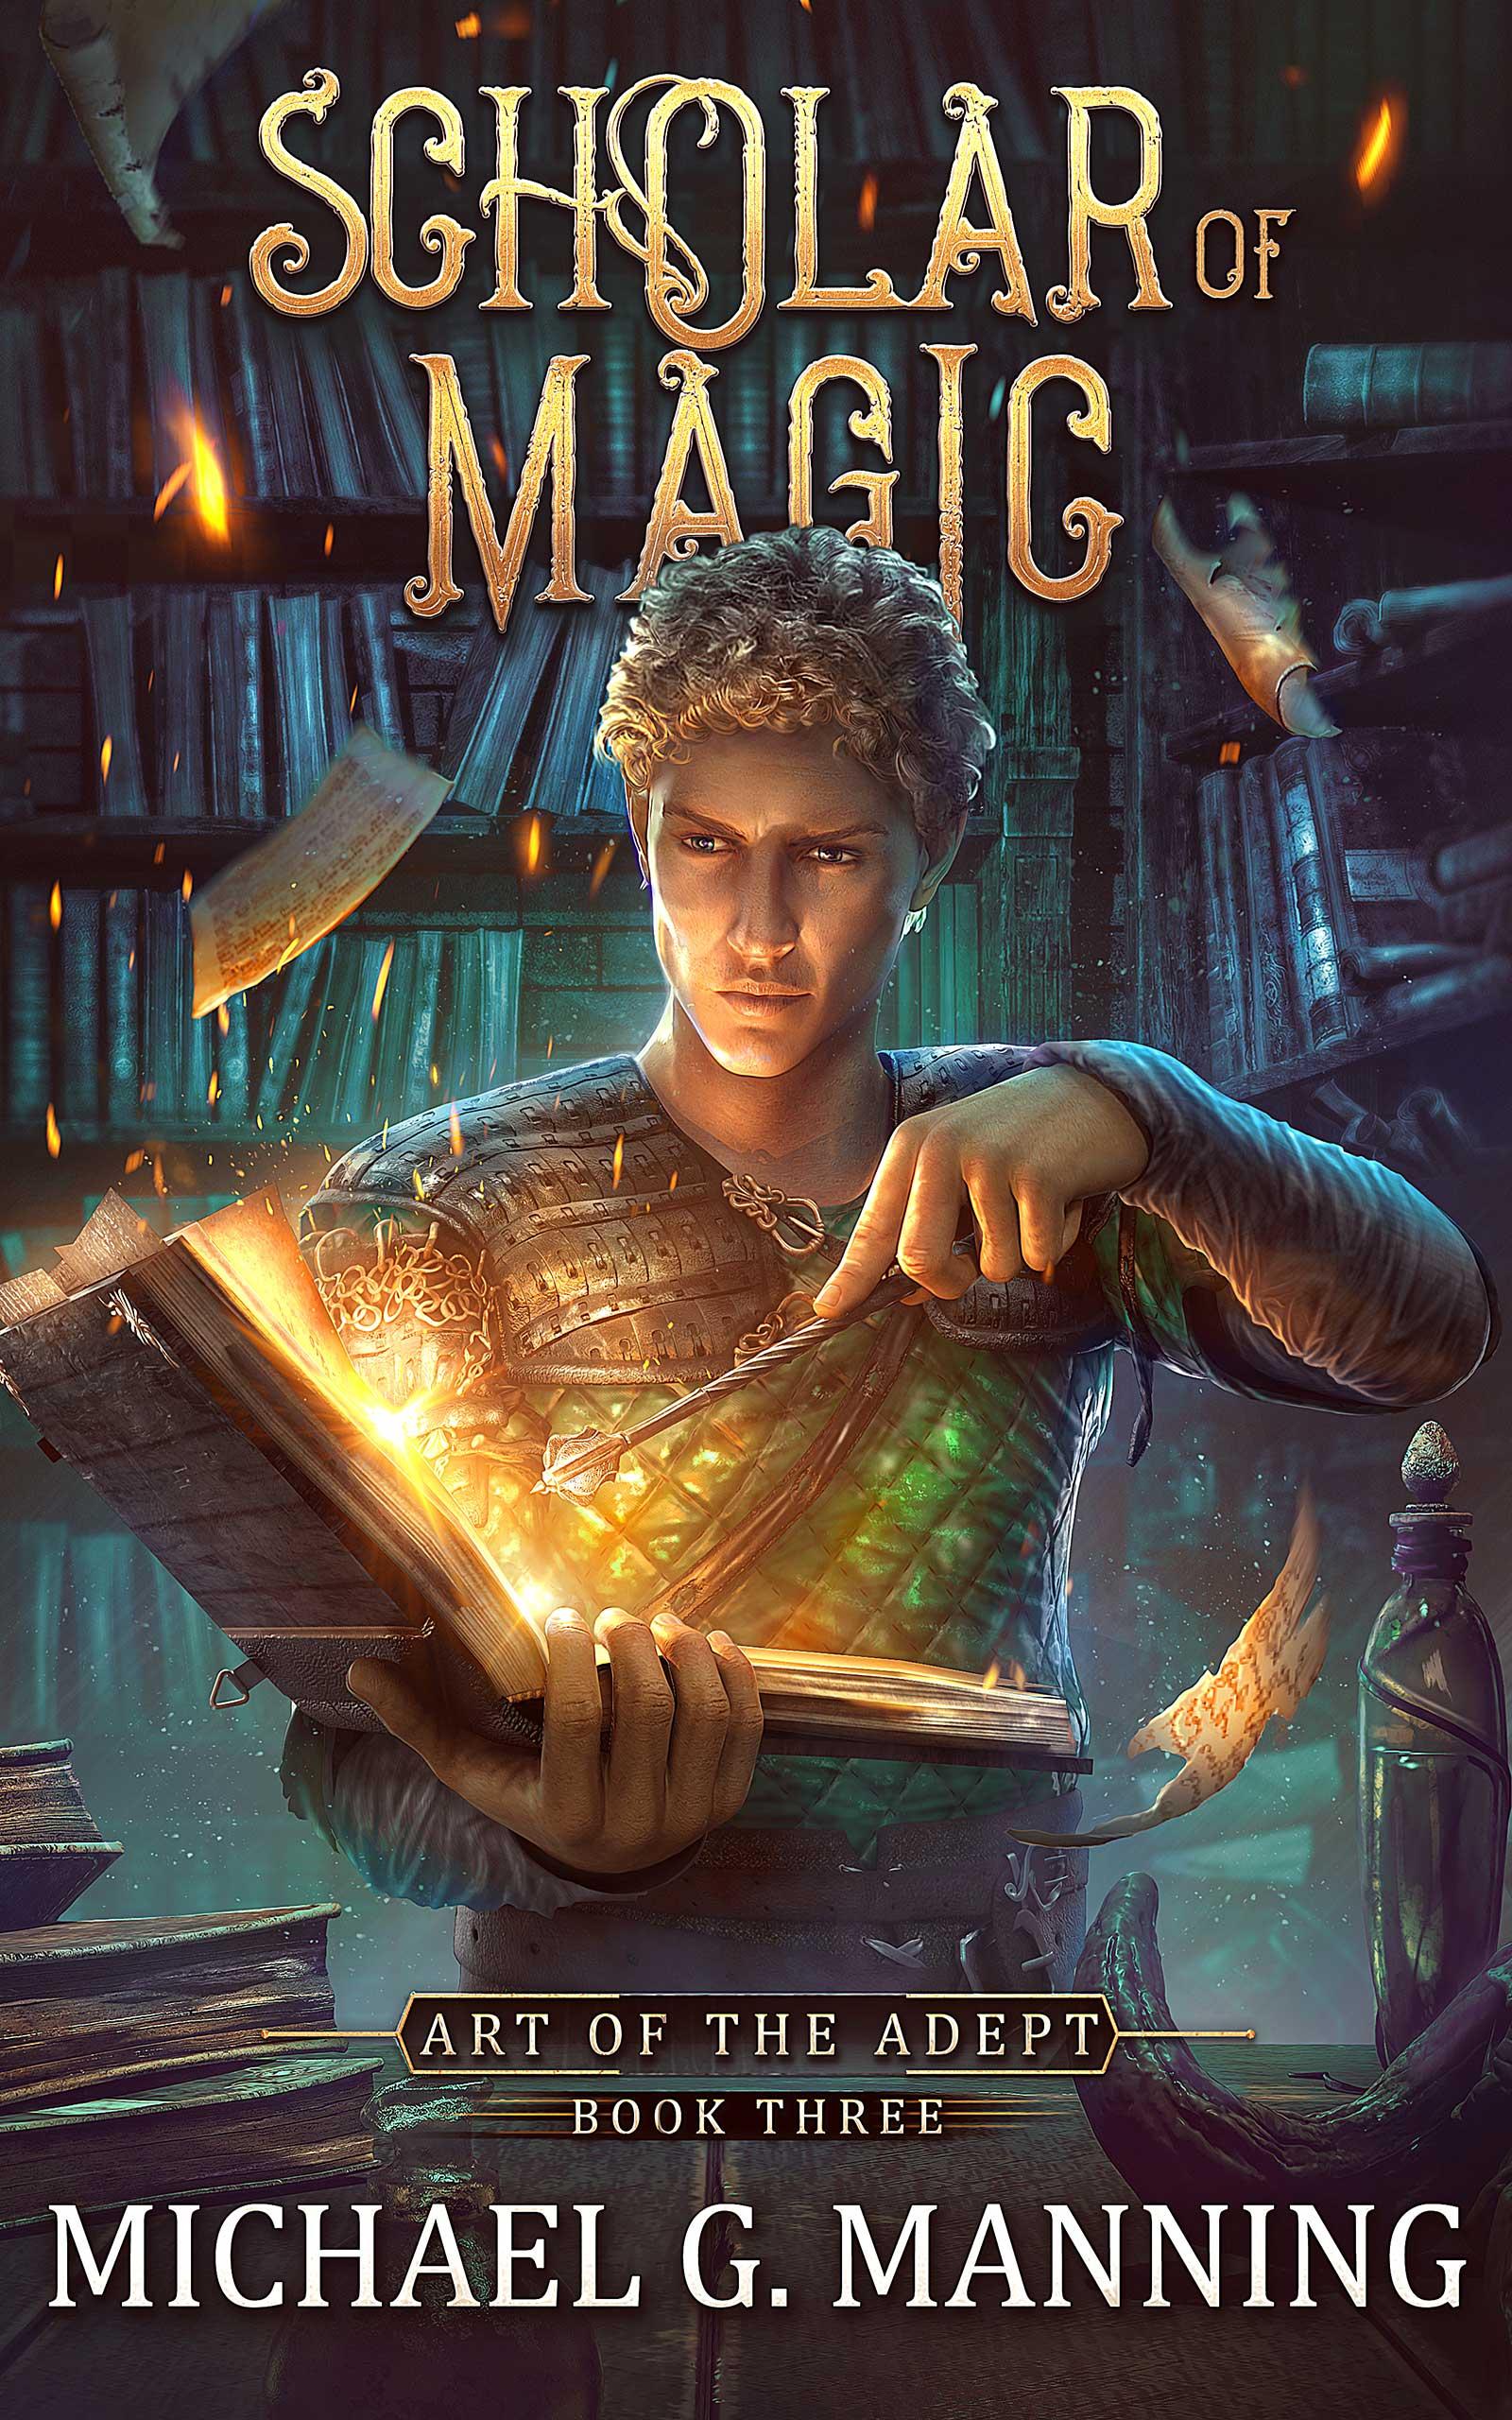 Scholar of Magic - Michael G. Manning